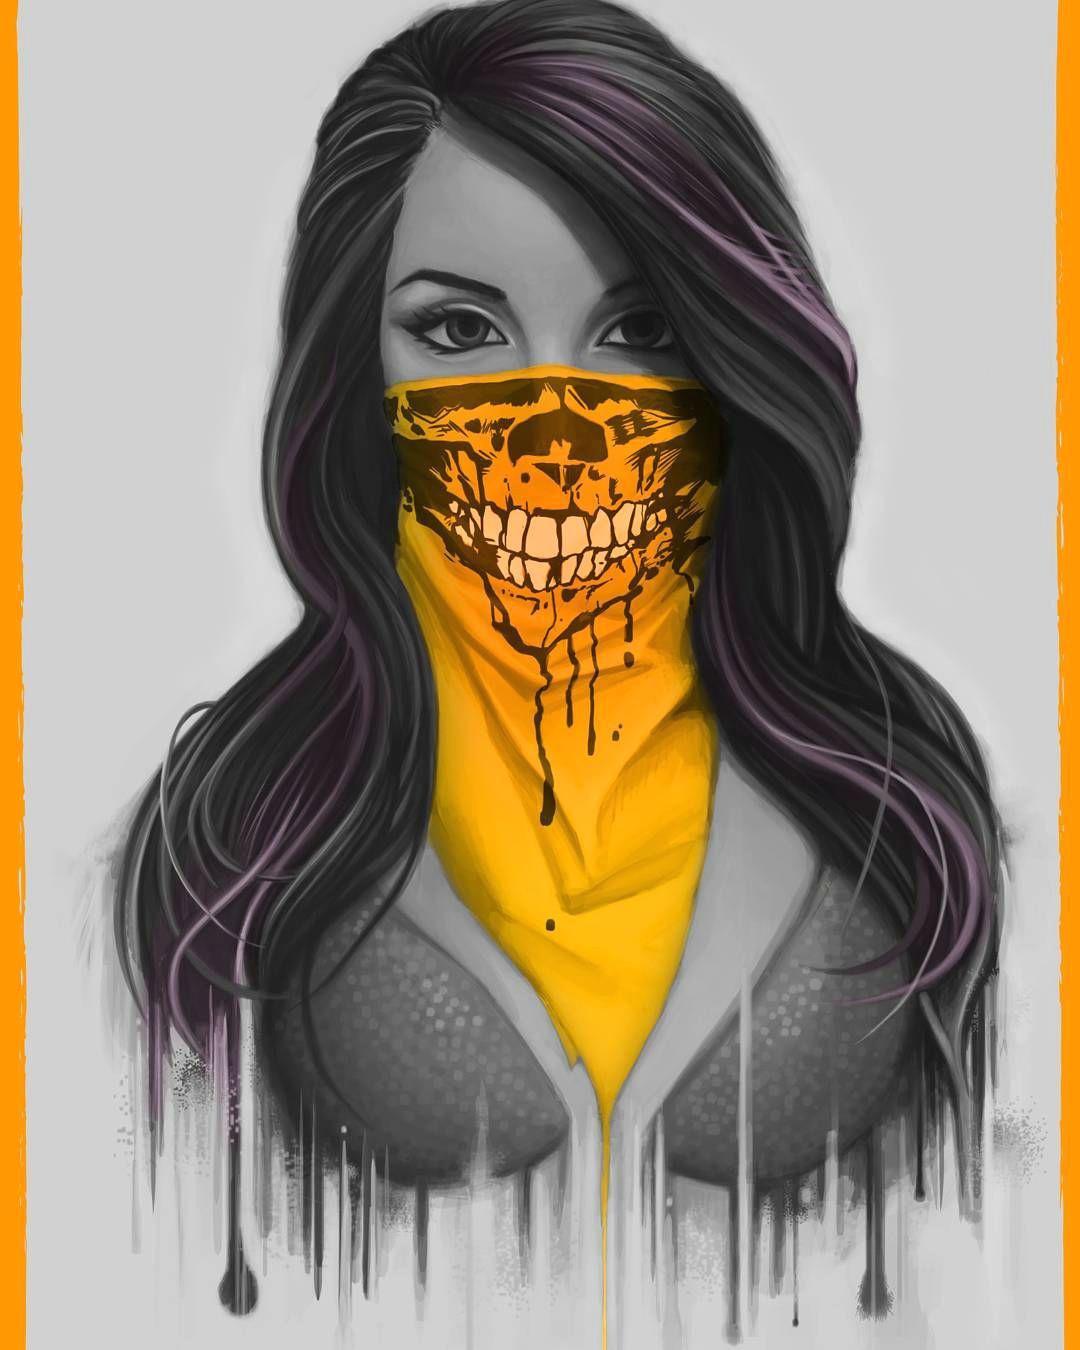 bandit mask digitalpainting art potraitart painting digital ink photoshop wacom cintiq art grey orange skeleton tattooart tattoo